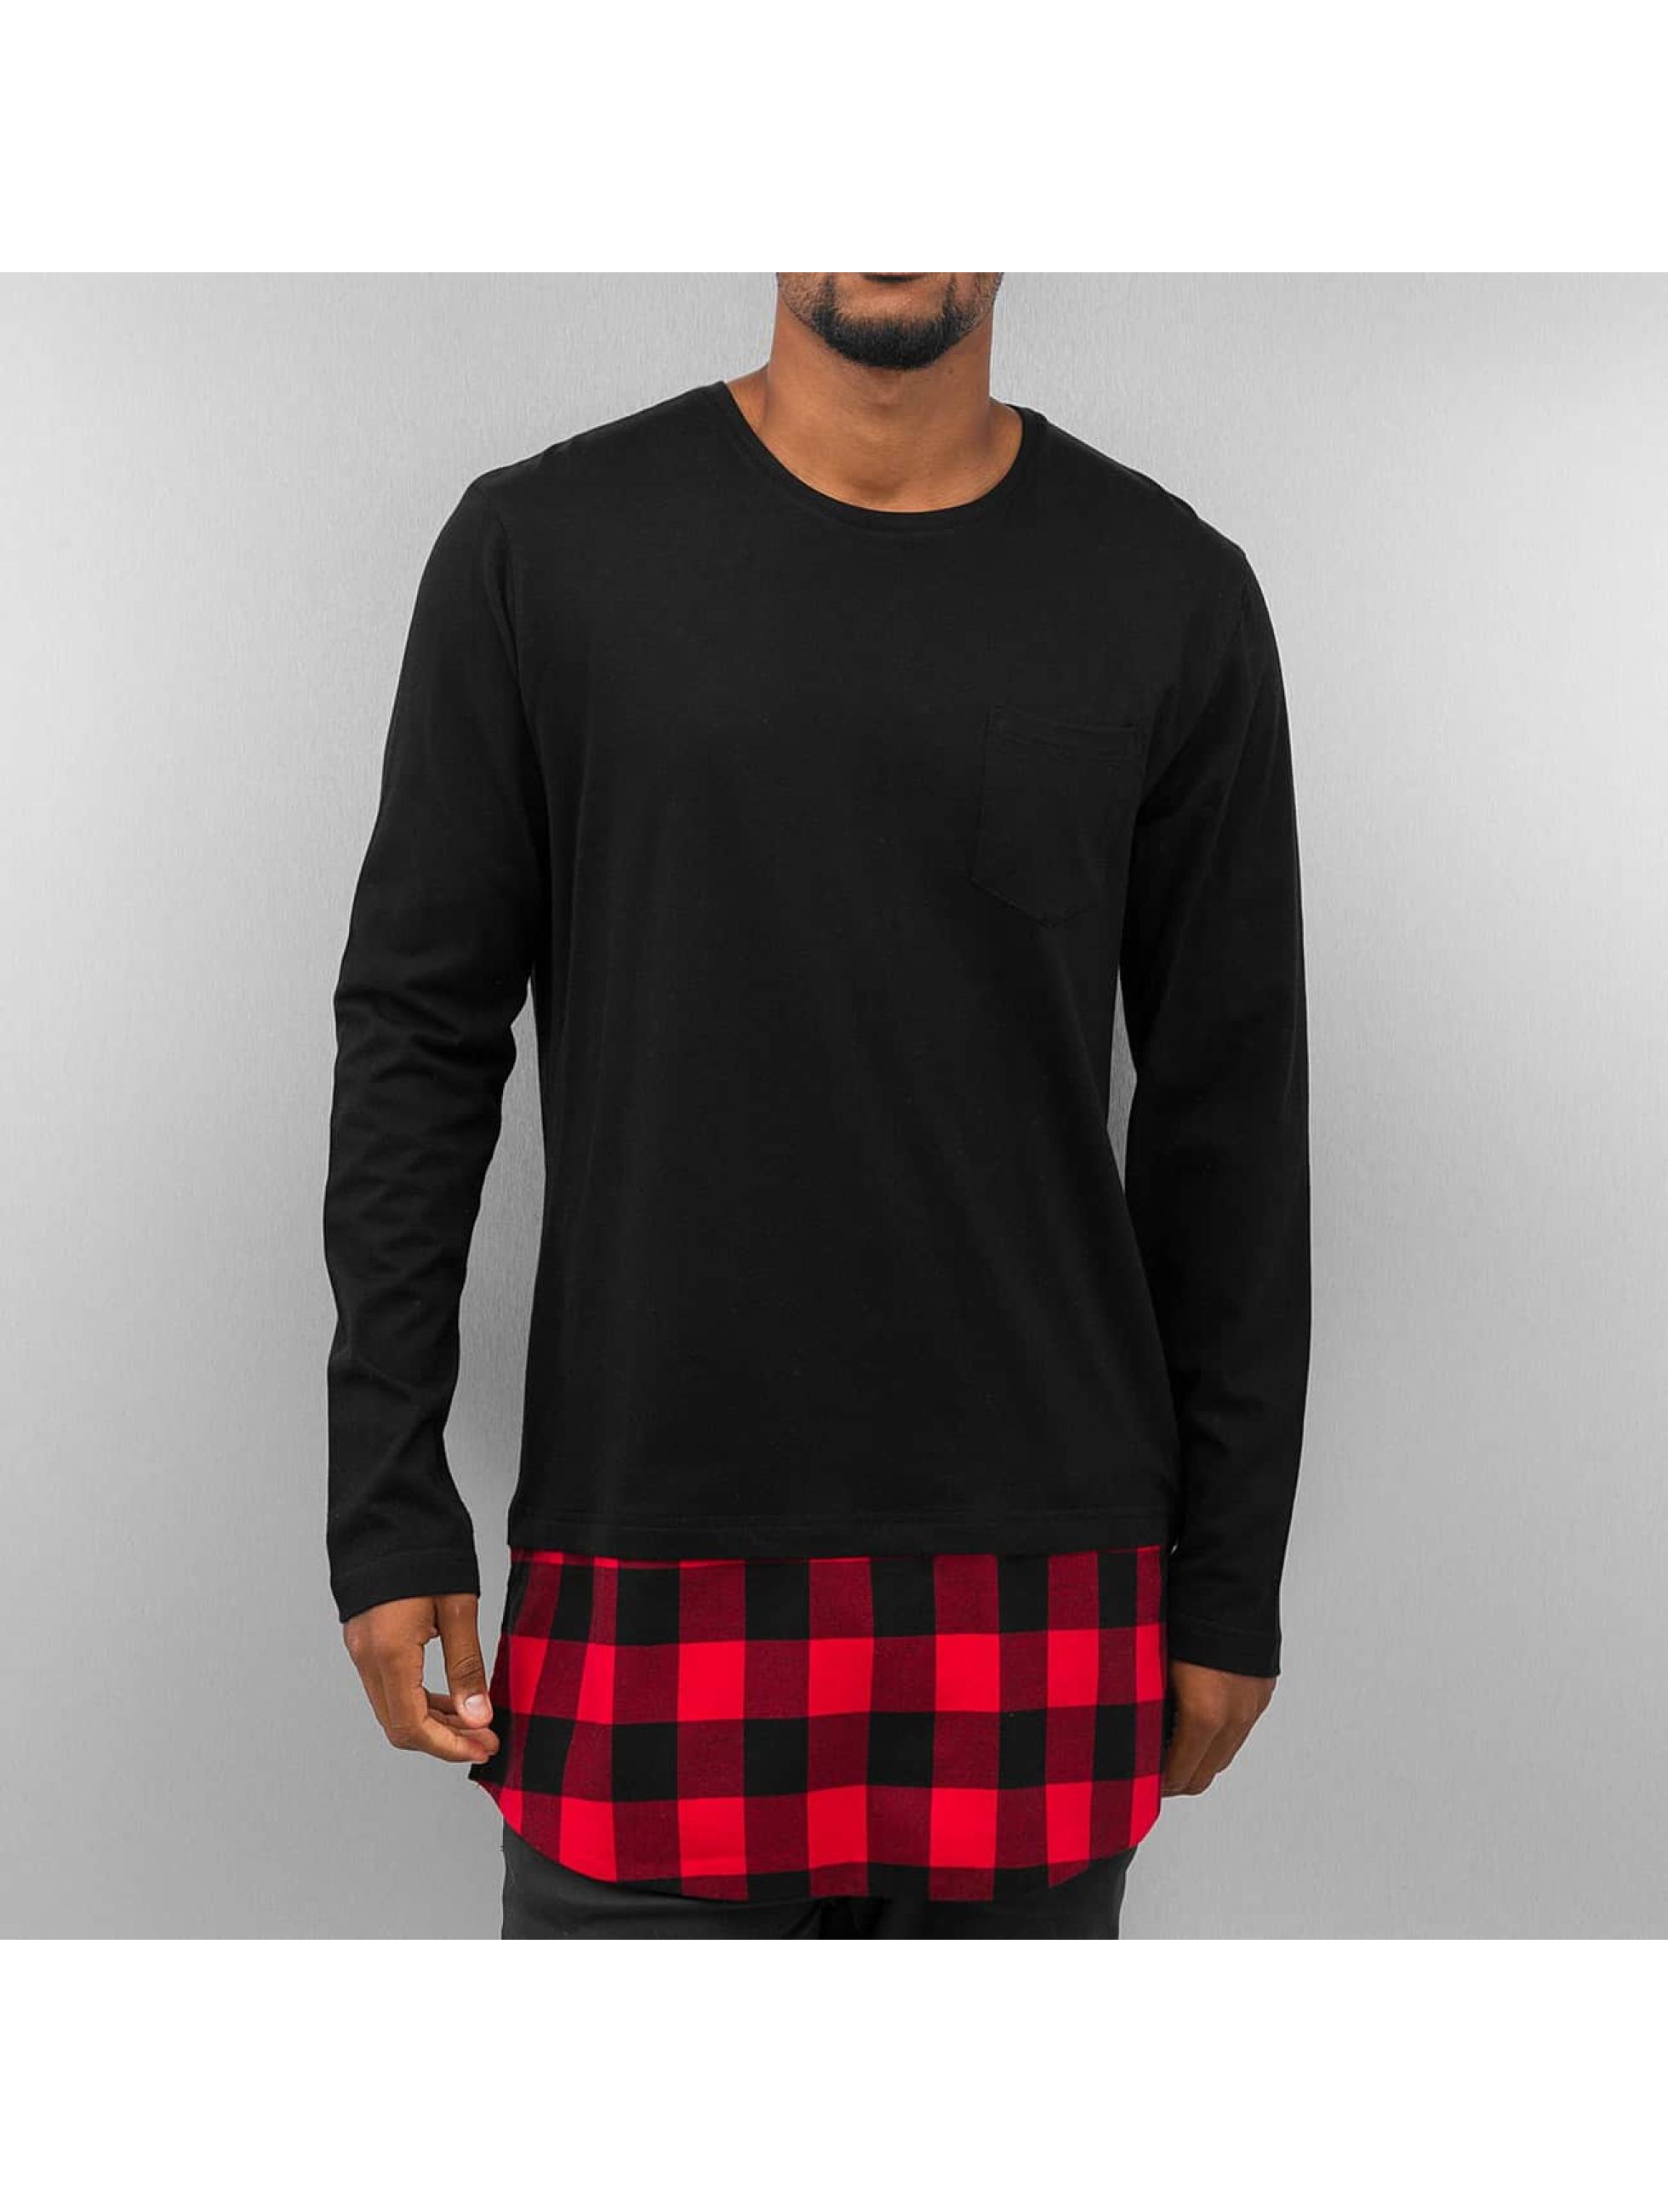 Urban Classics Long Shaped Flanell Bottom Pocket Longsleeve Black Black Red